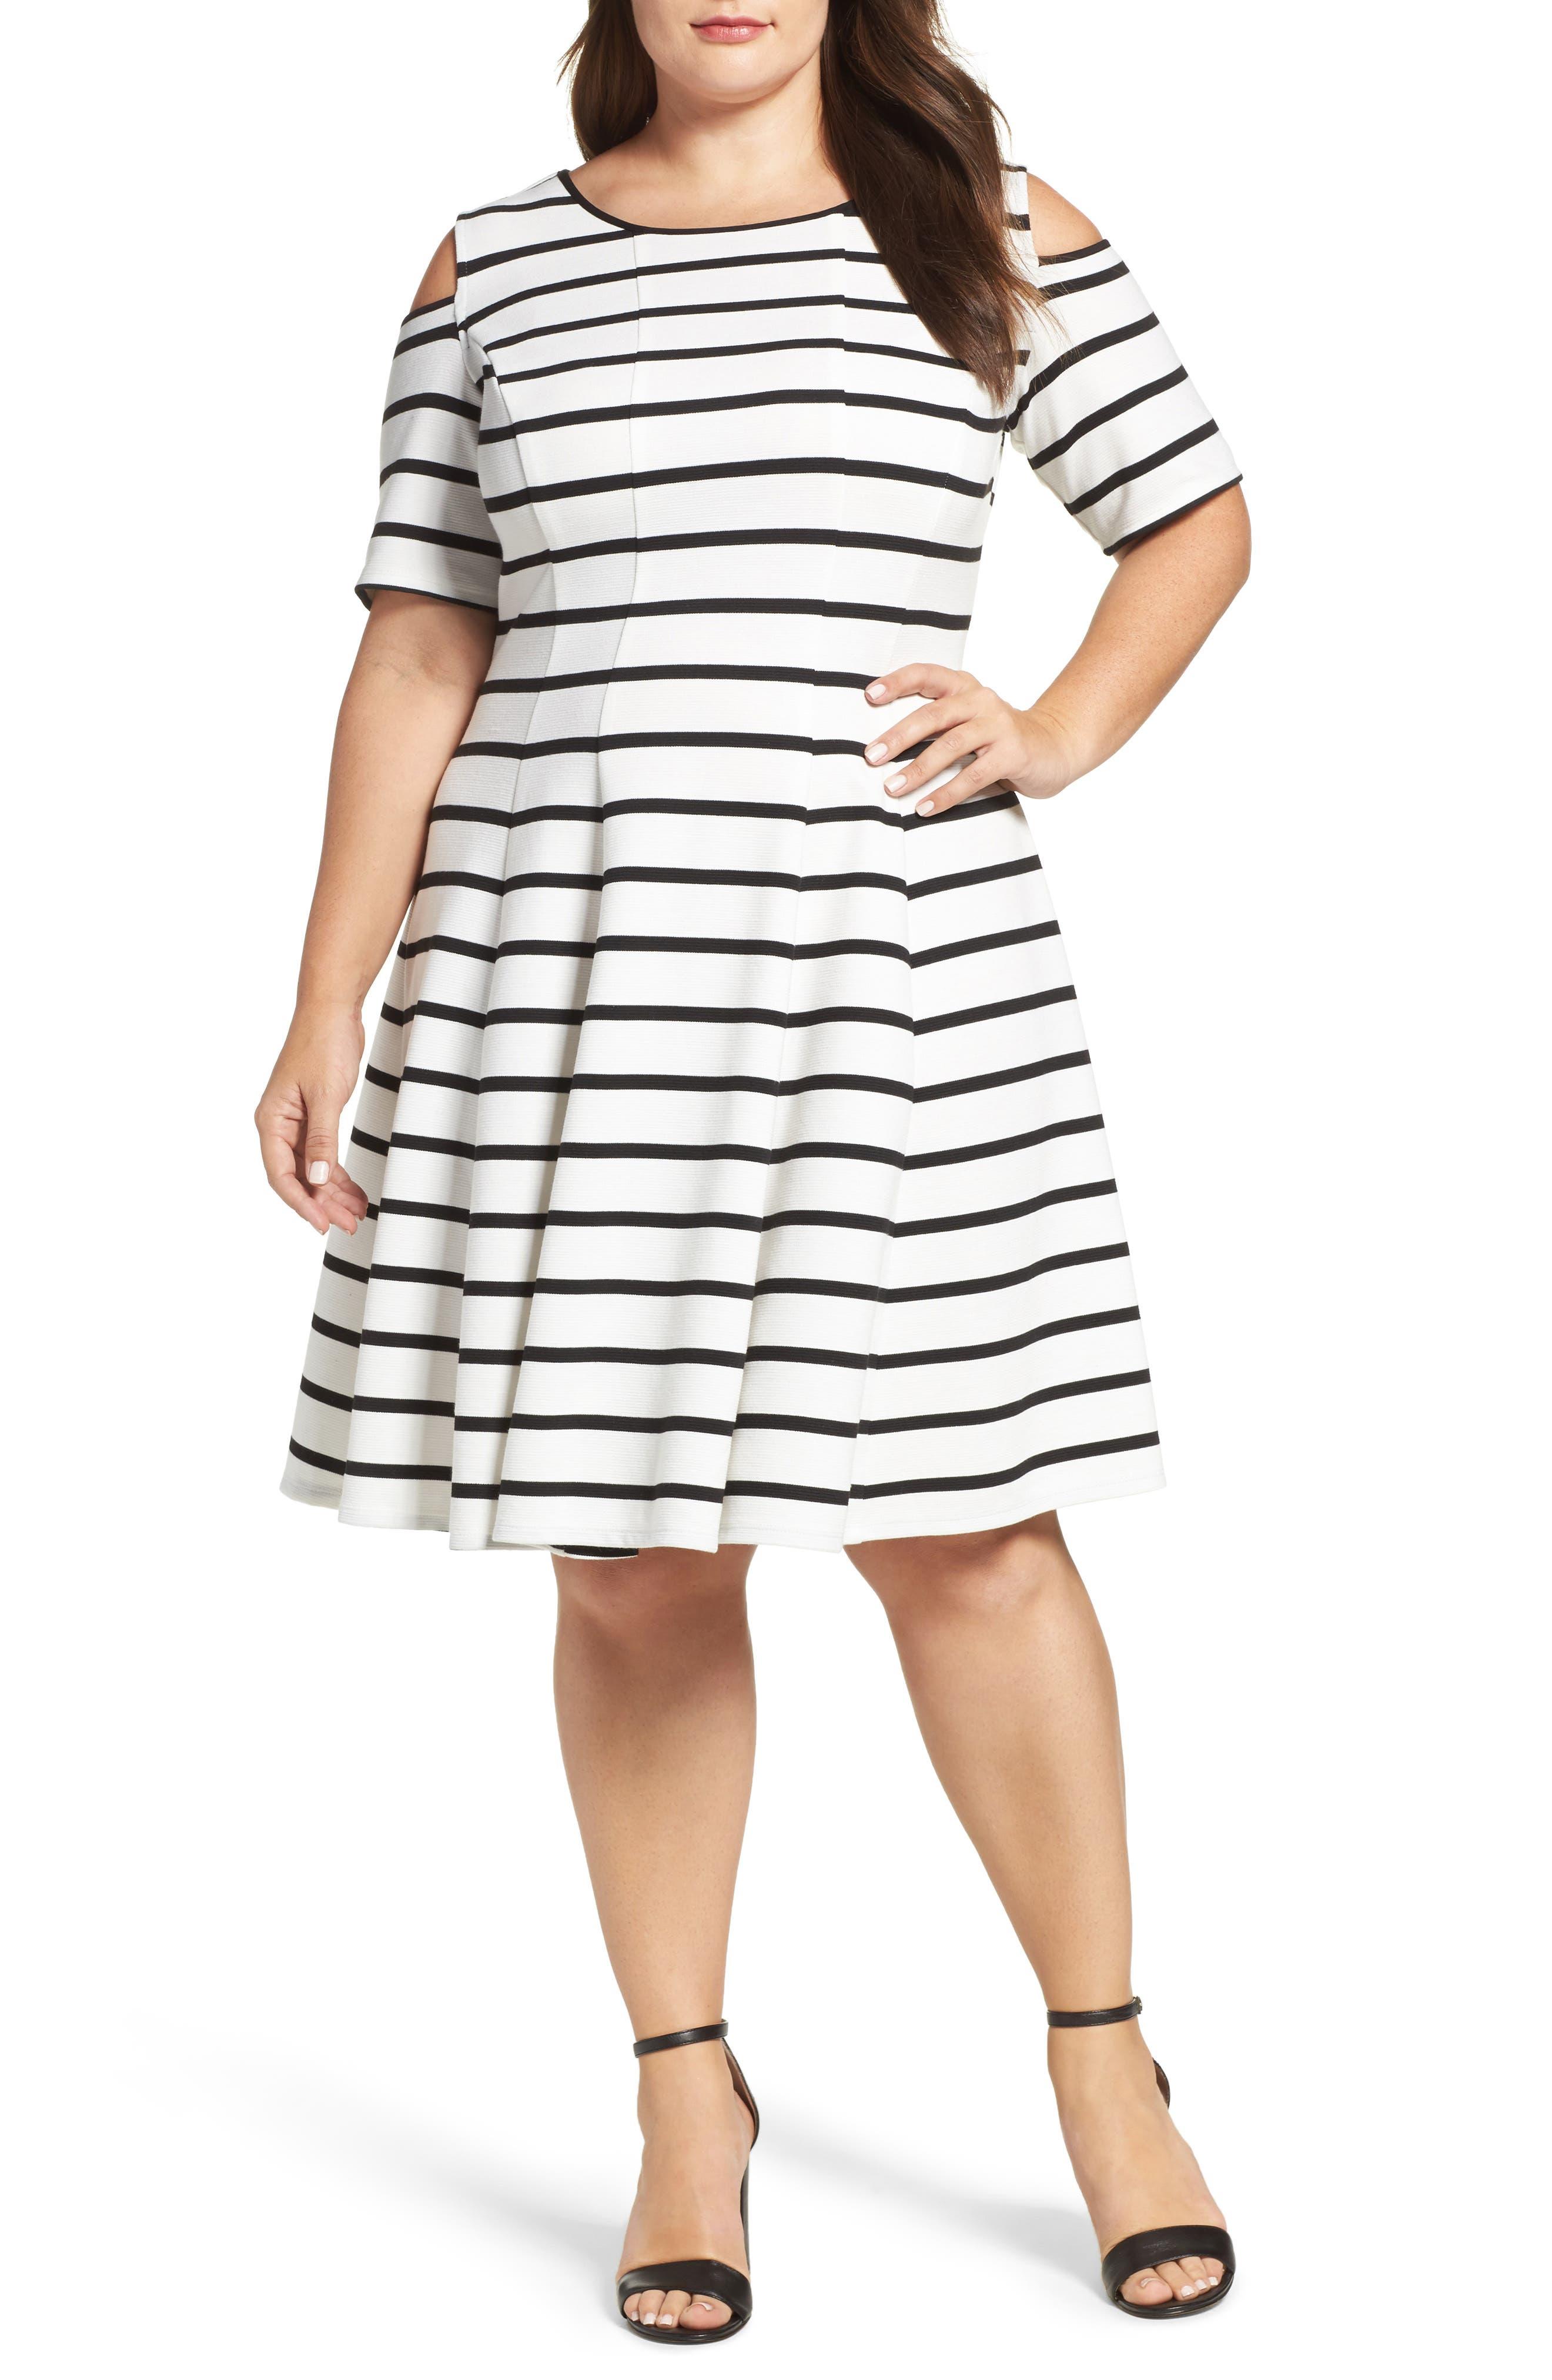 Main Image - Gabby Skye Cold Shoulder Fit & Flare Dress (Plus Size)